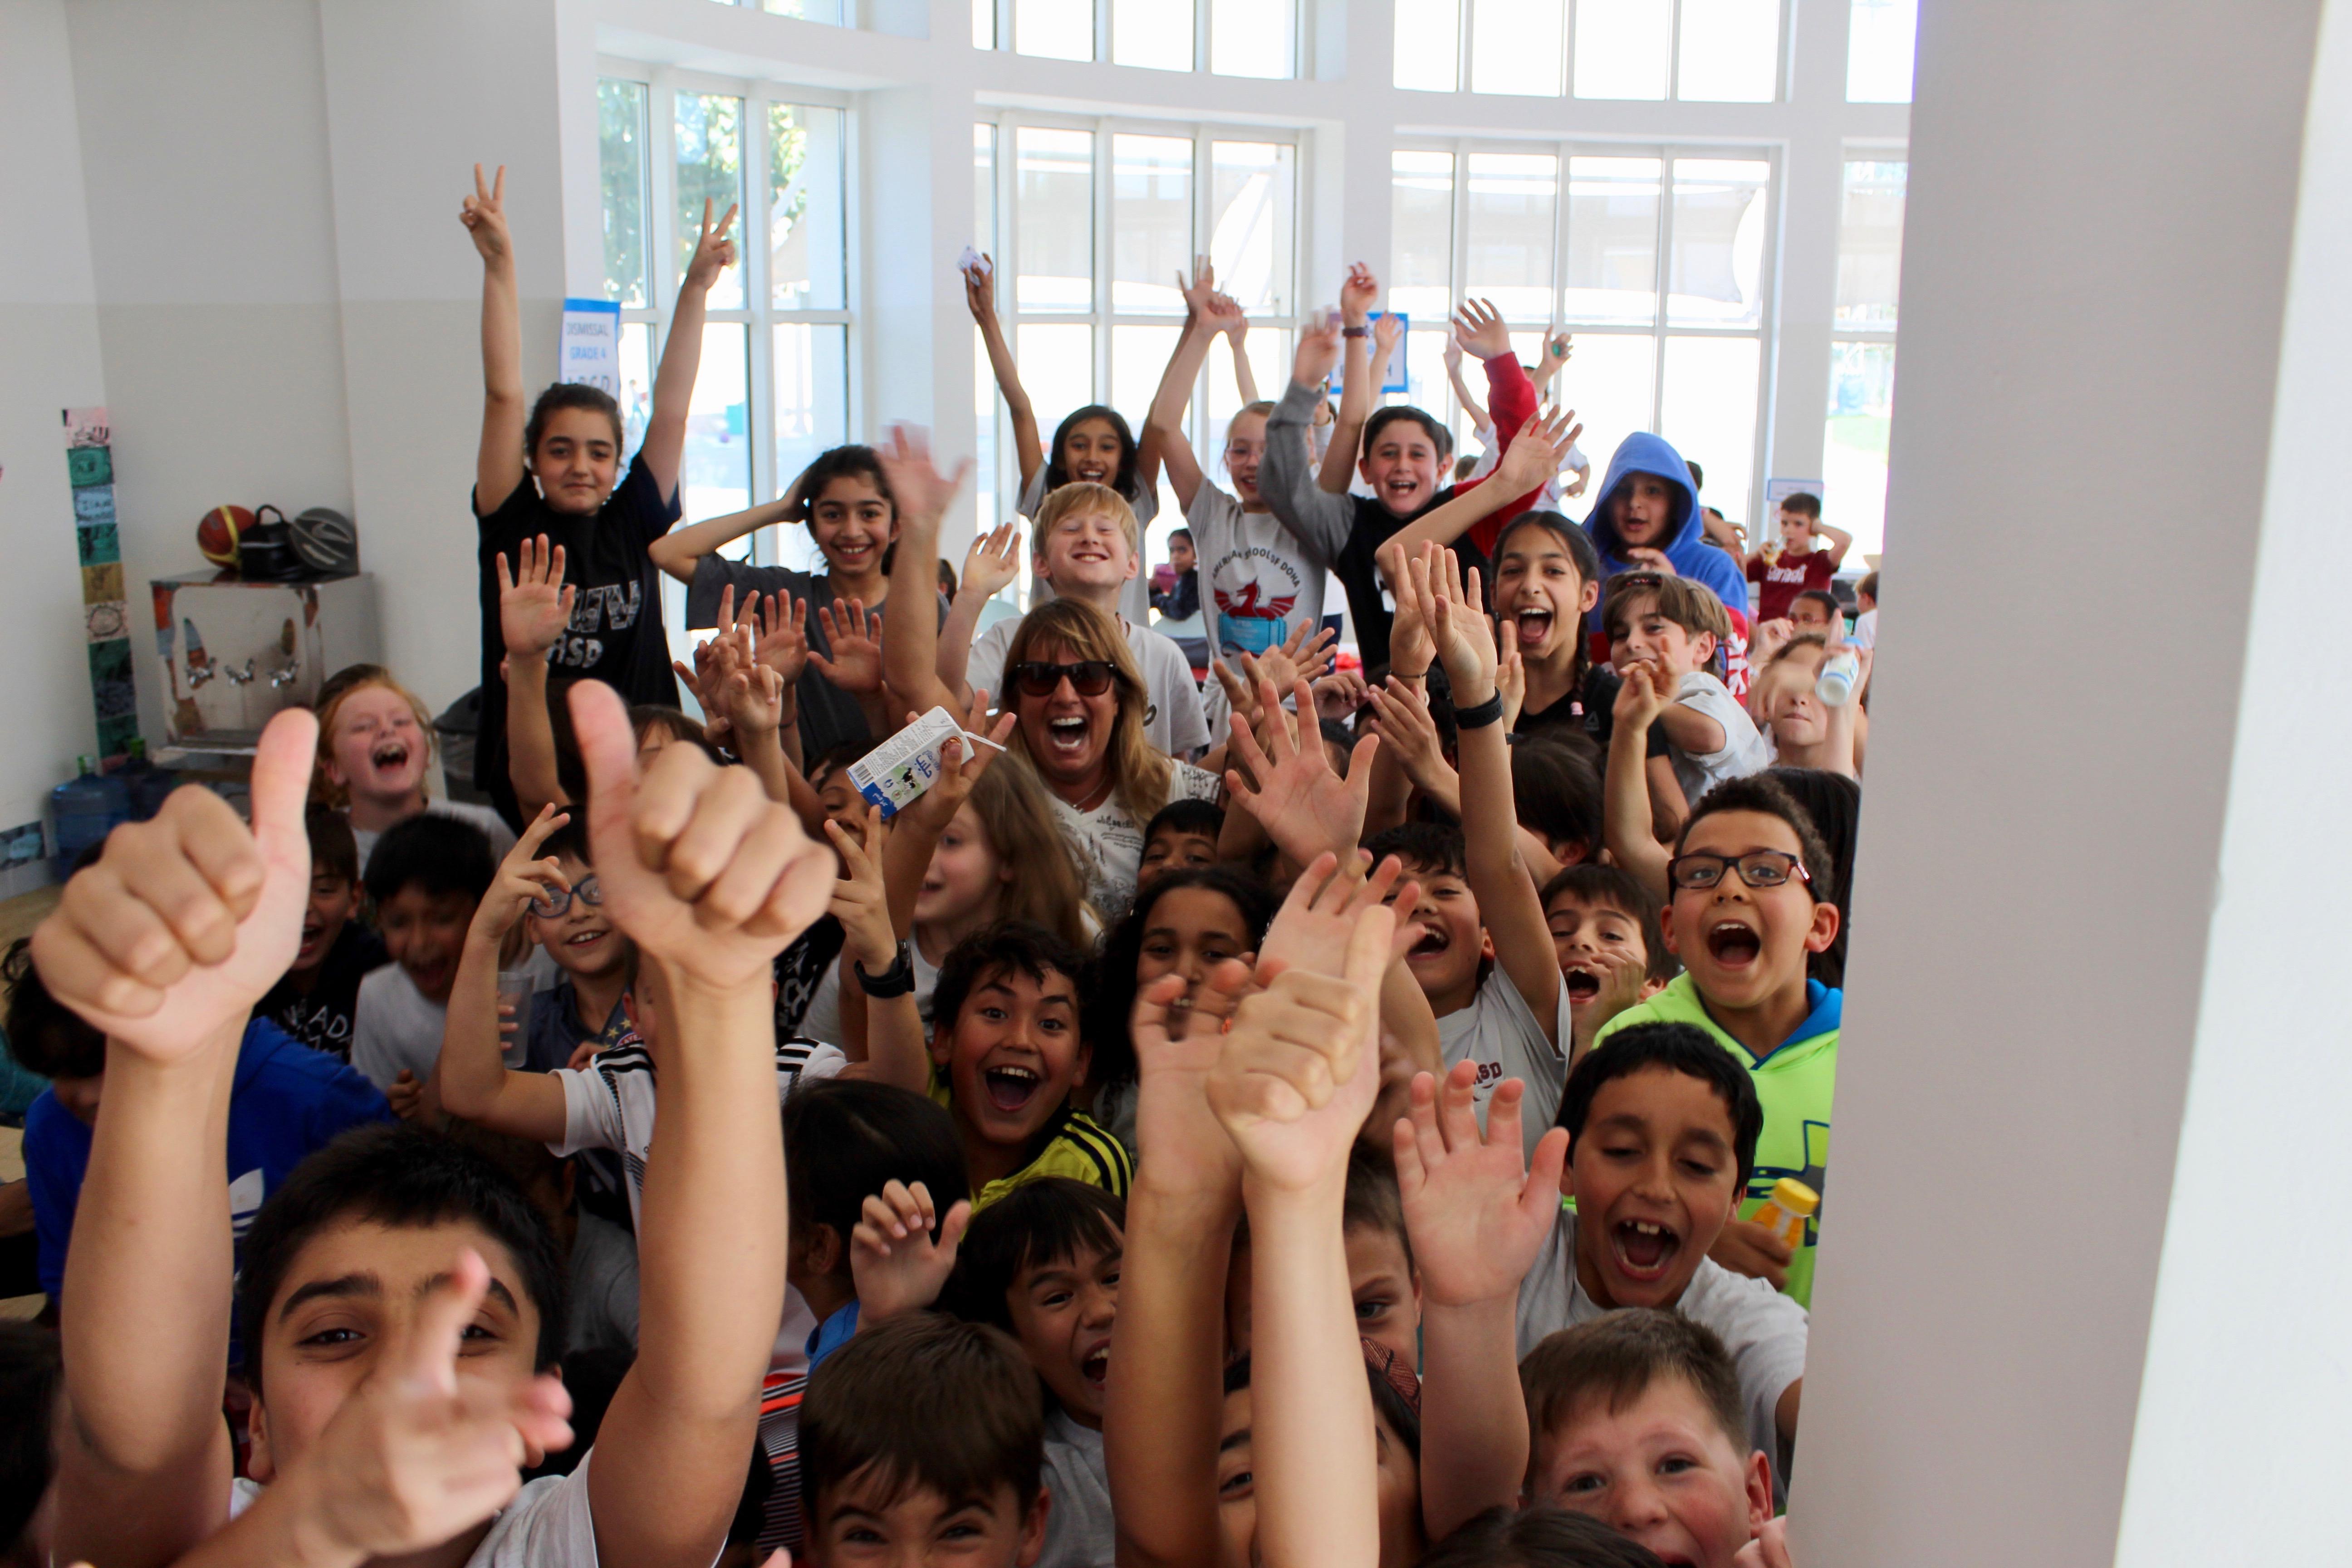 2019 - Saying Goodbye to ASD - The Kids!!!!